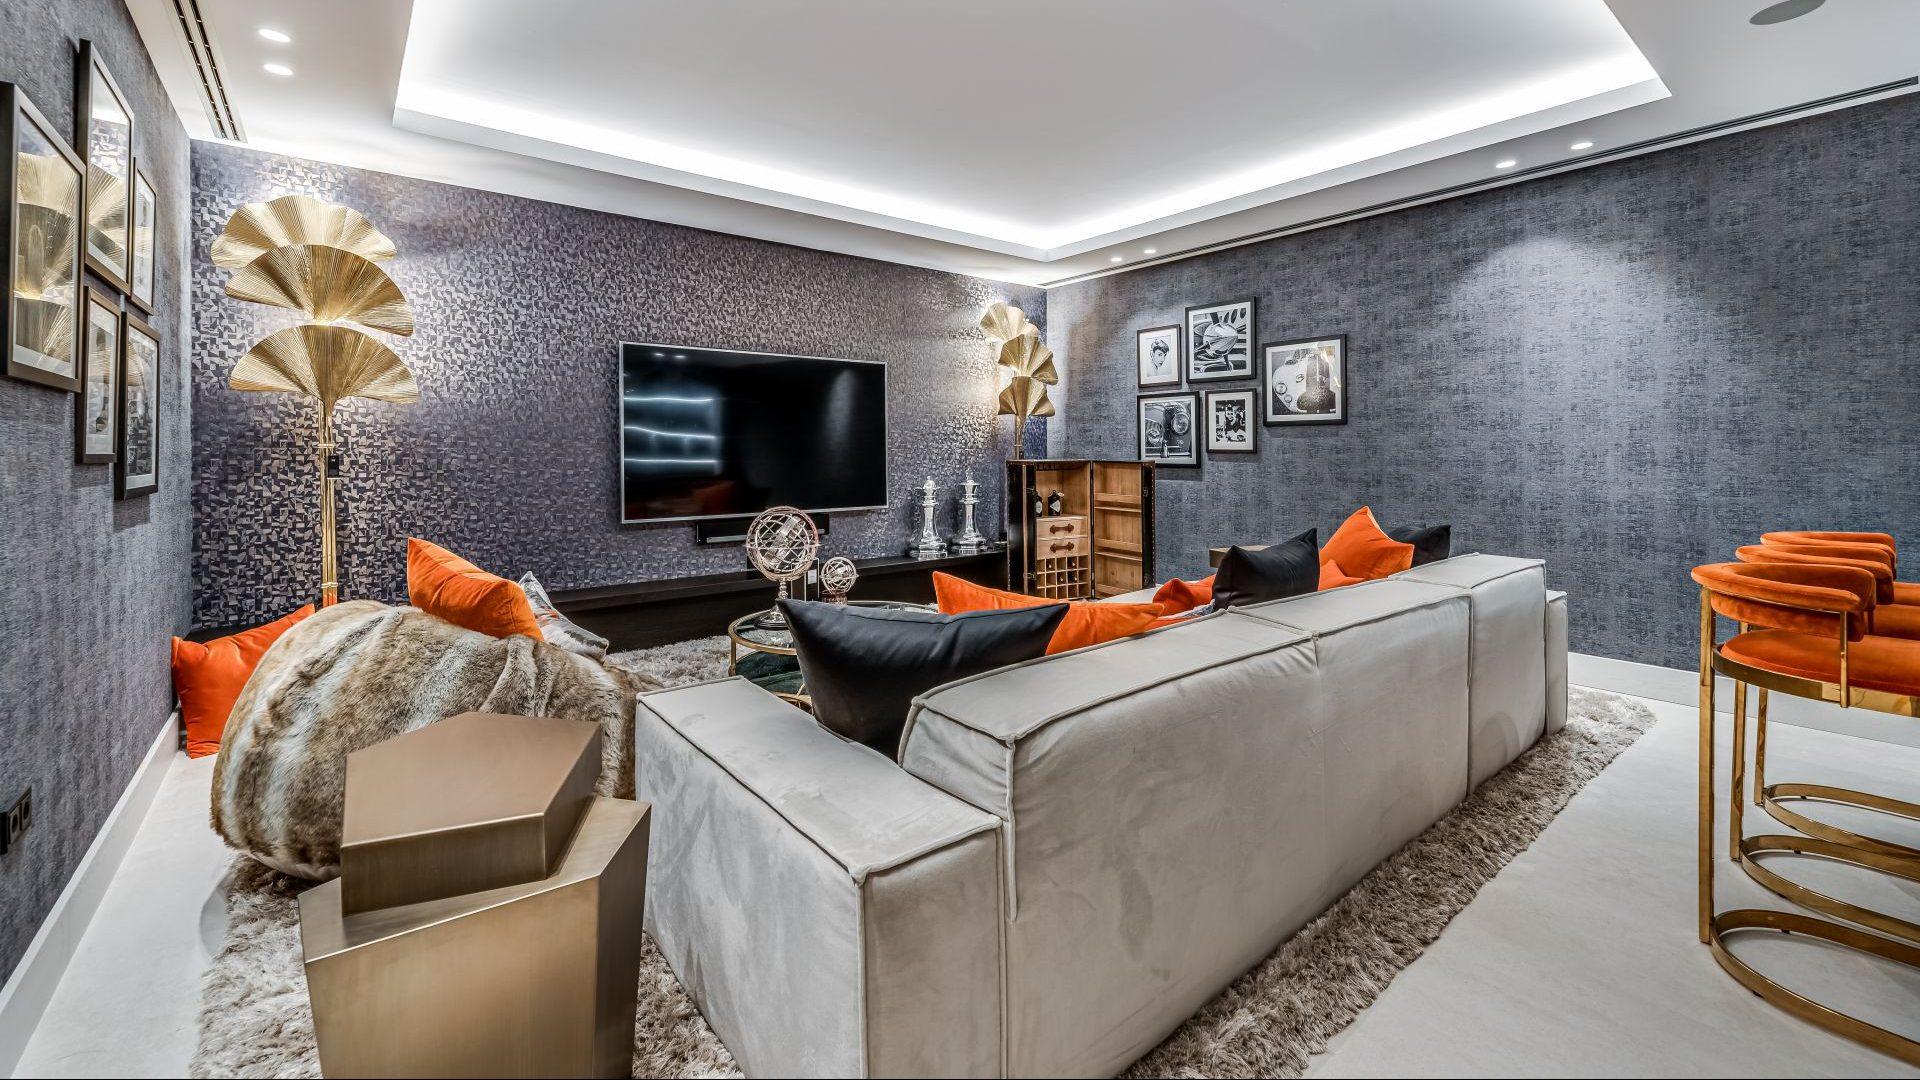 Exclusive cinema room of this luxury villa